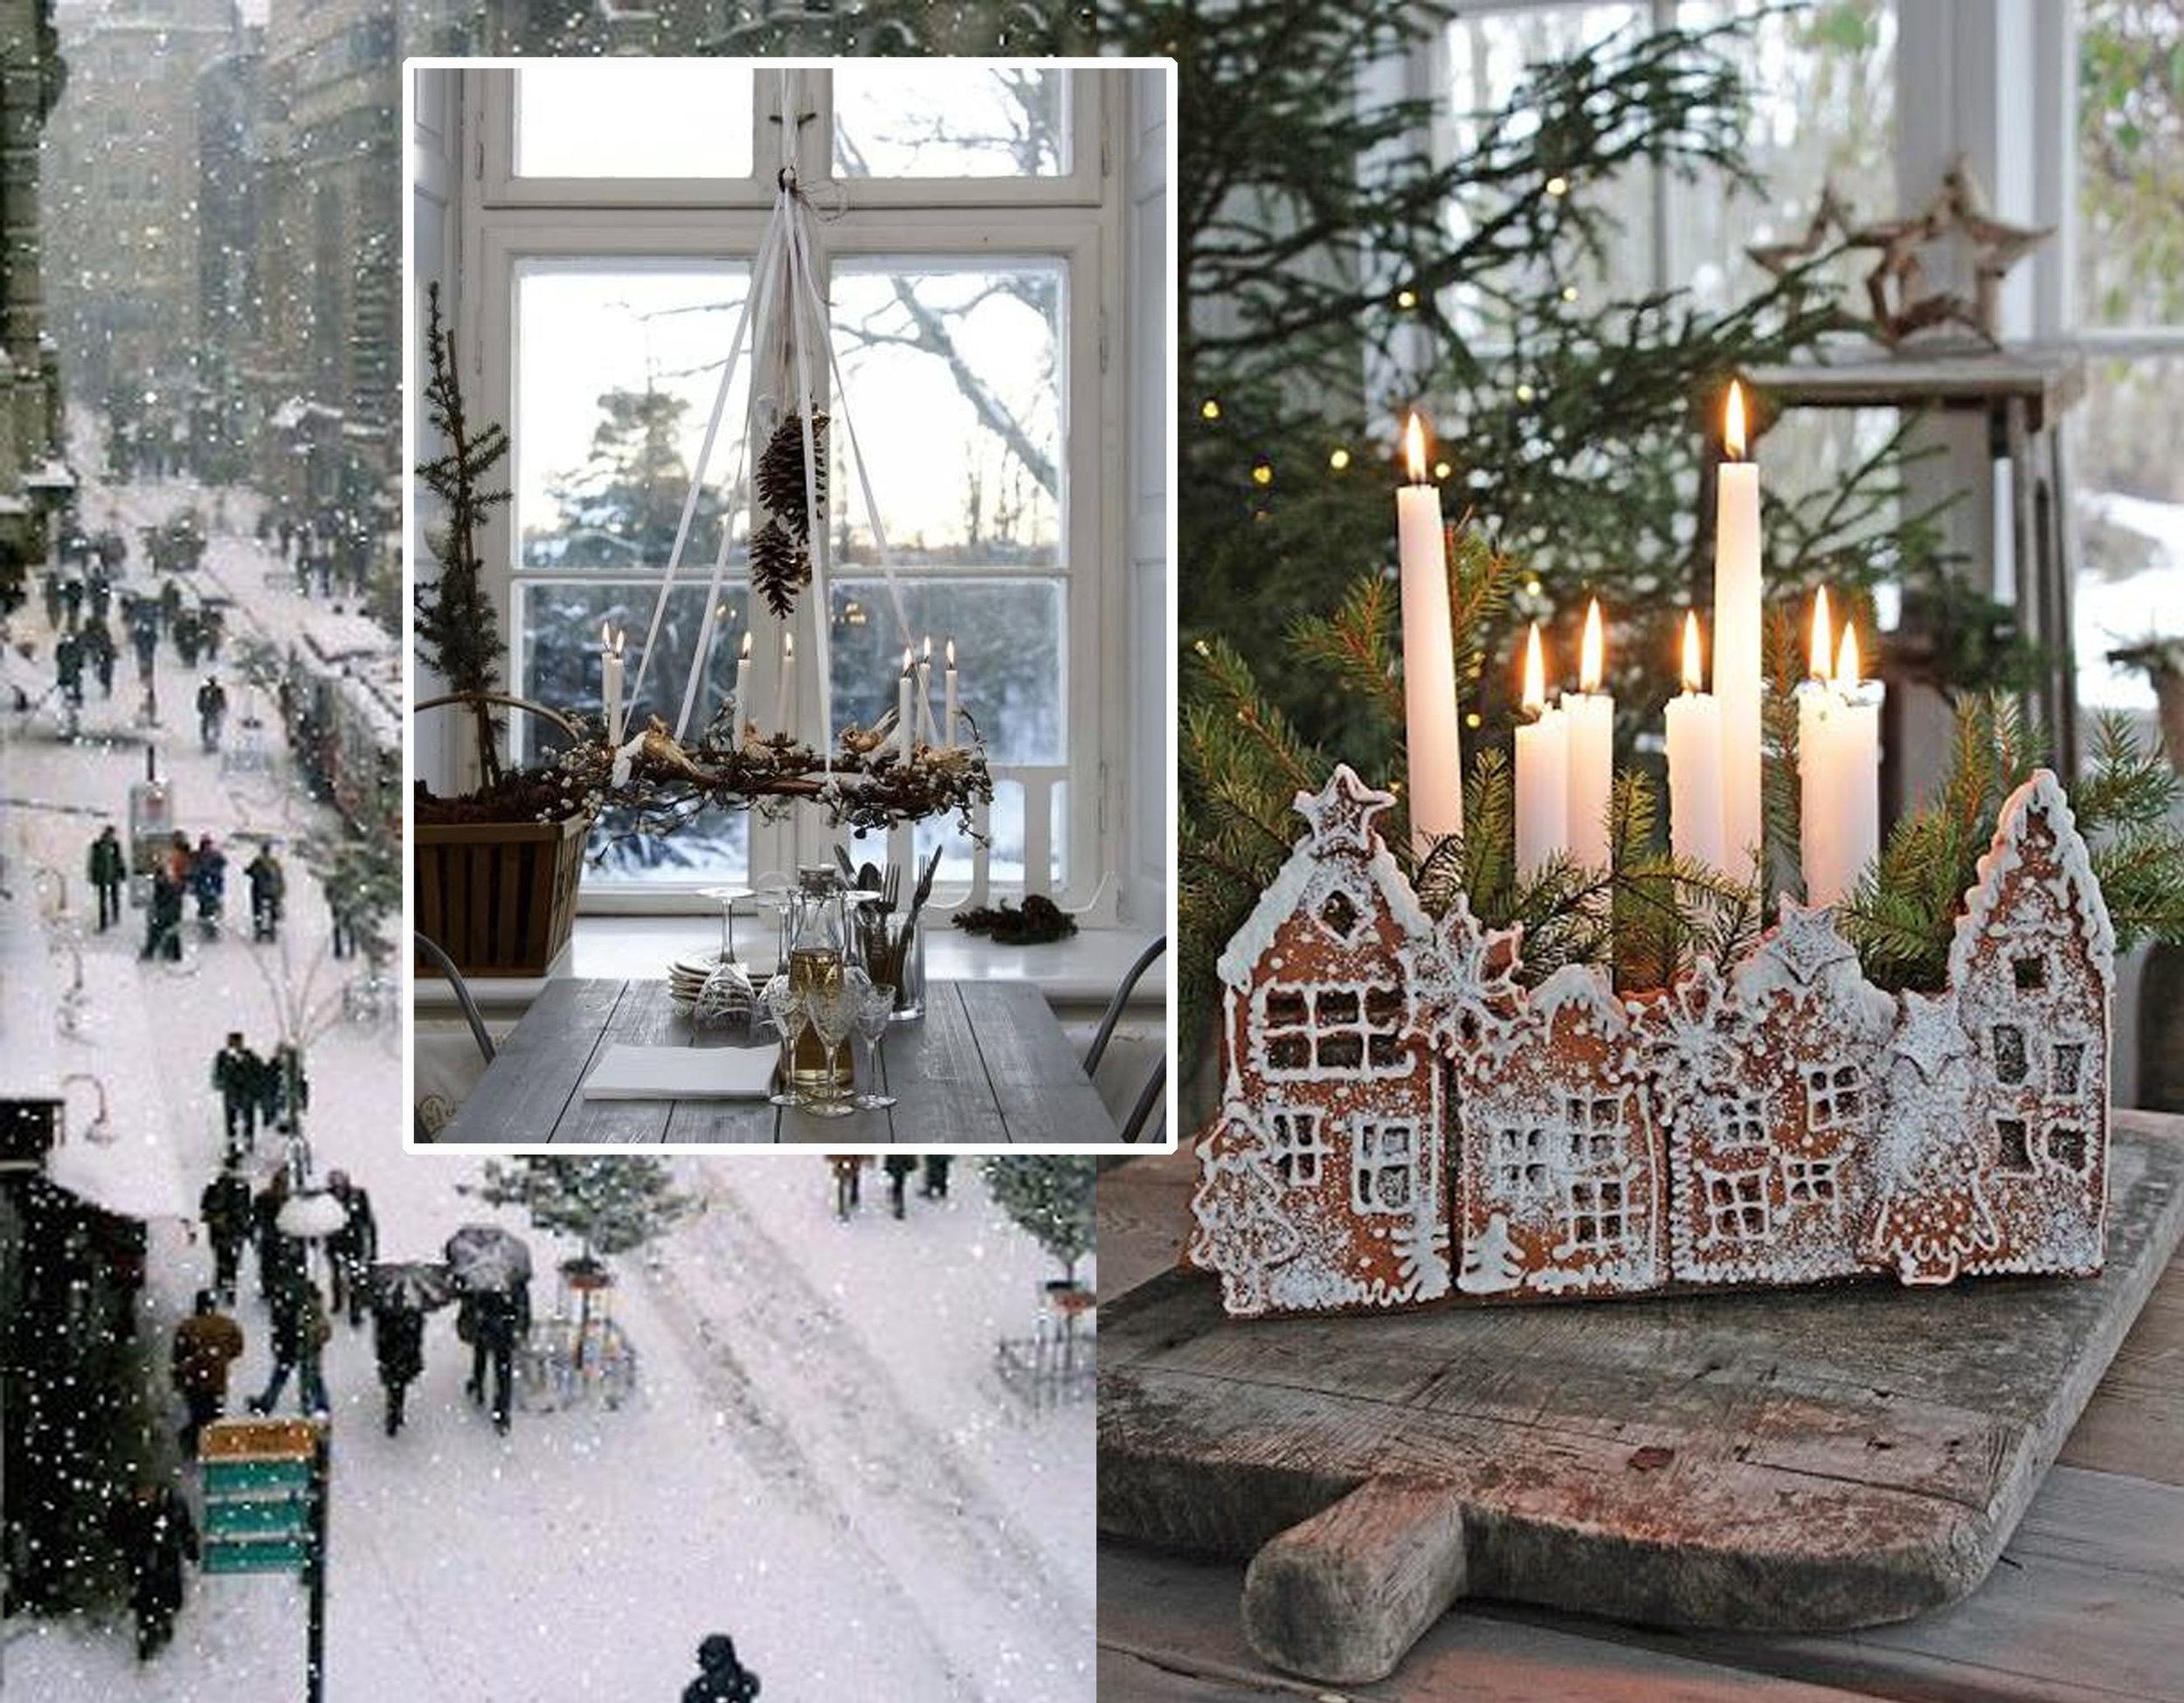 city under the snow  Irene Mids  - candle chandelier via  The Ivy House  - Christmas decoration via  Vibeke Design